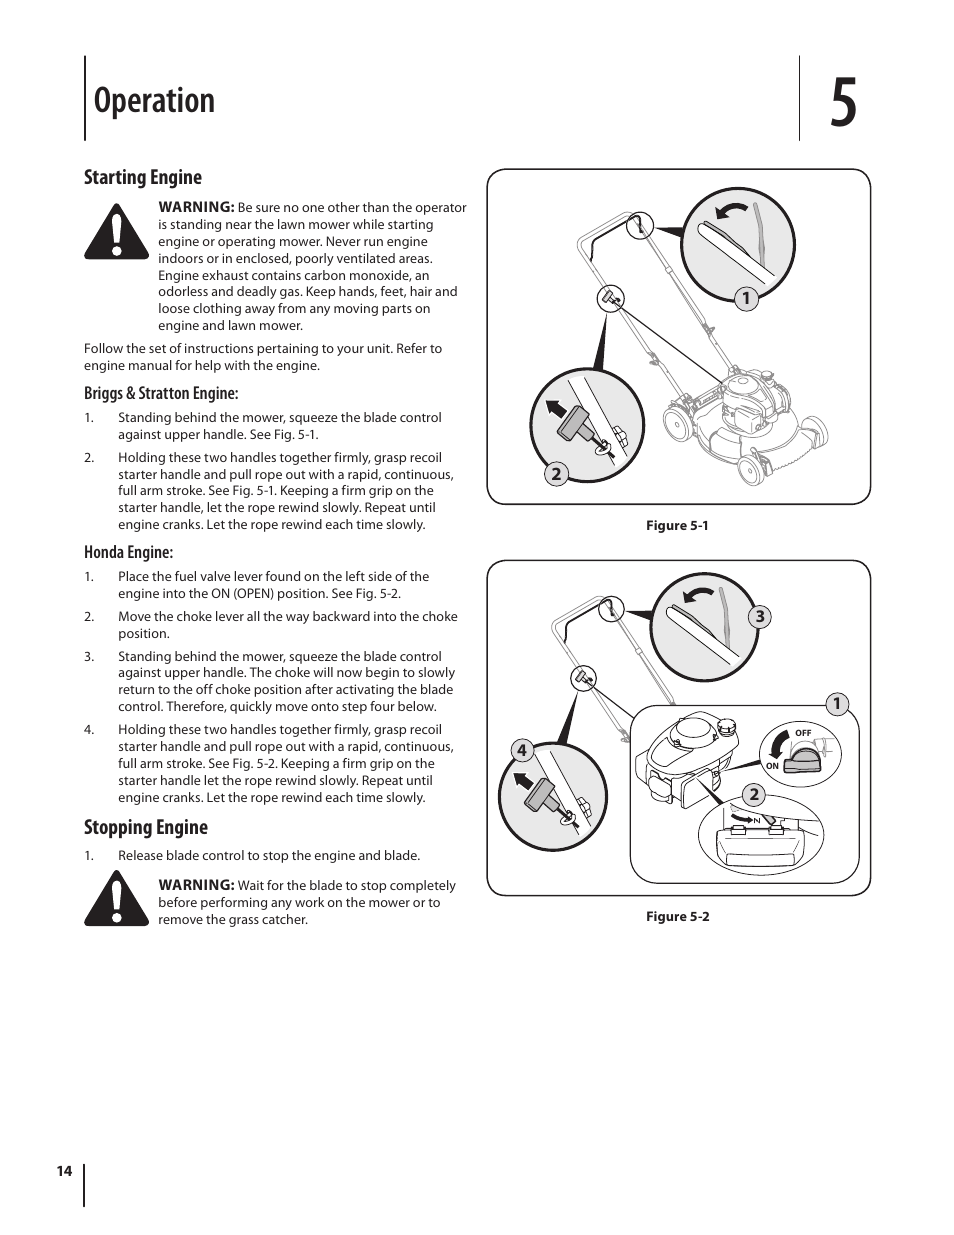 Operation, Starting engine, Stopping engine | Troy-Bilt